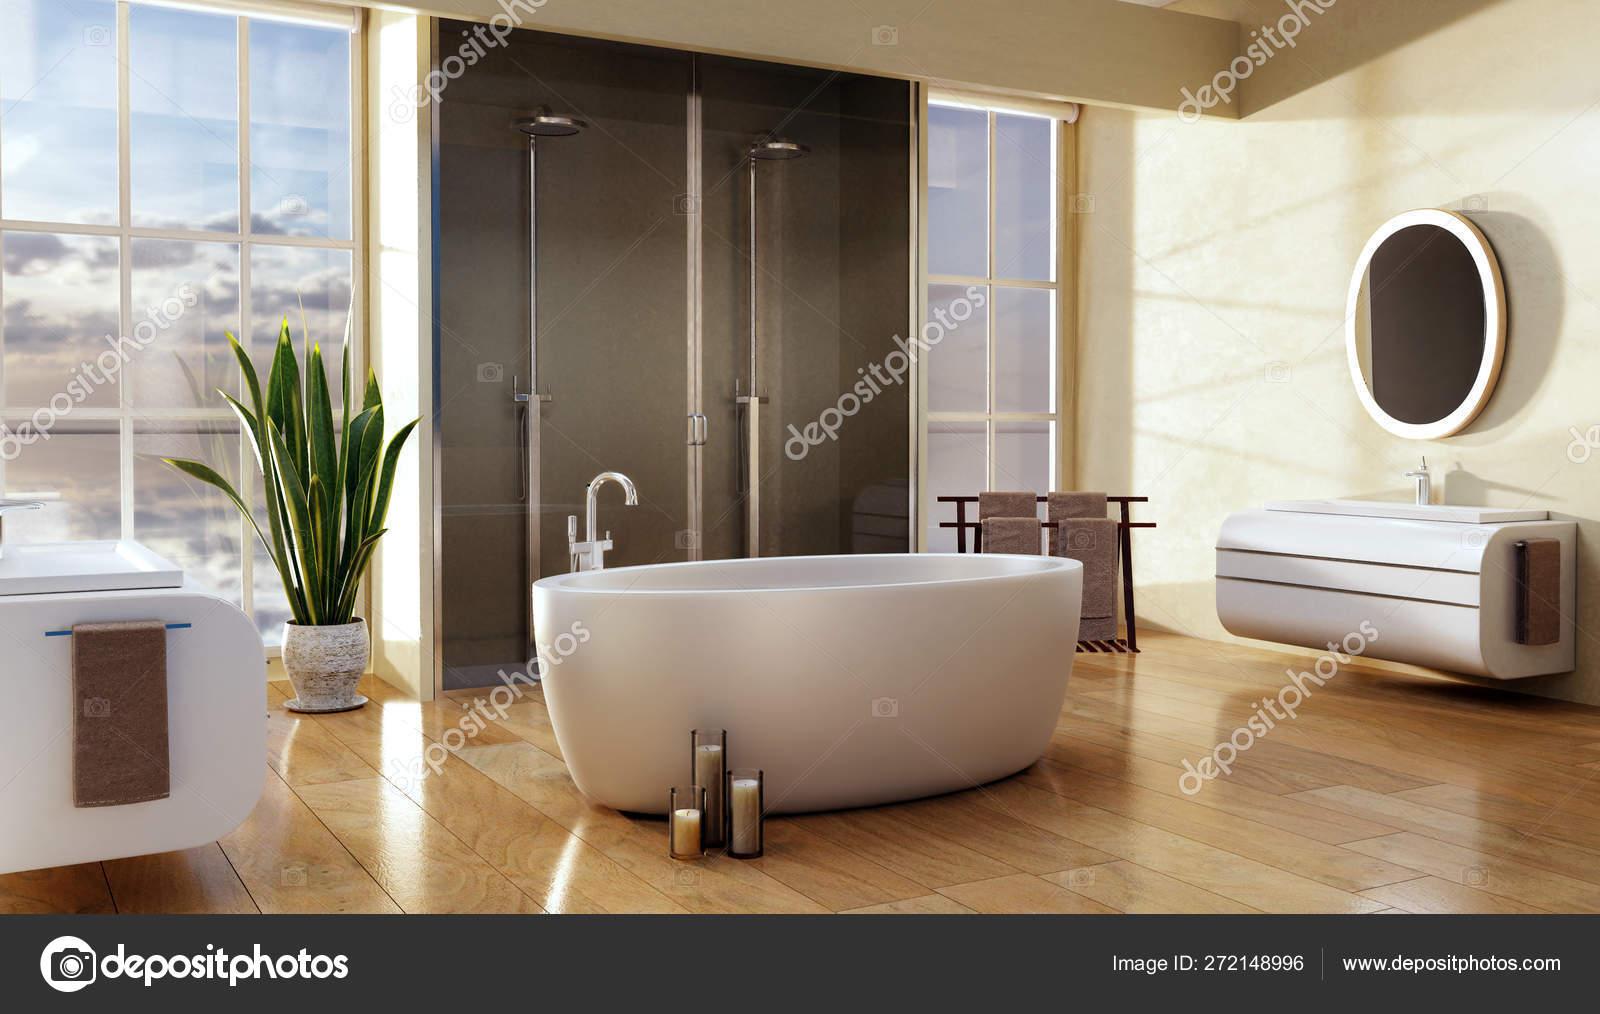 Illustration Modern Bathroom Big Oval Bath Double Shower Natural Light Stock Photo C Karelnoppe 272148996